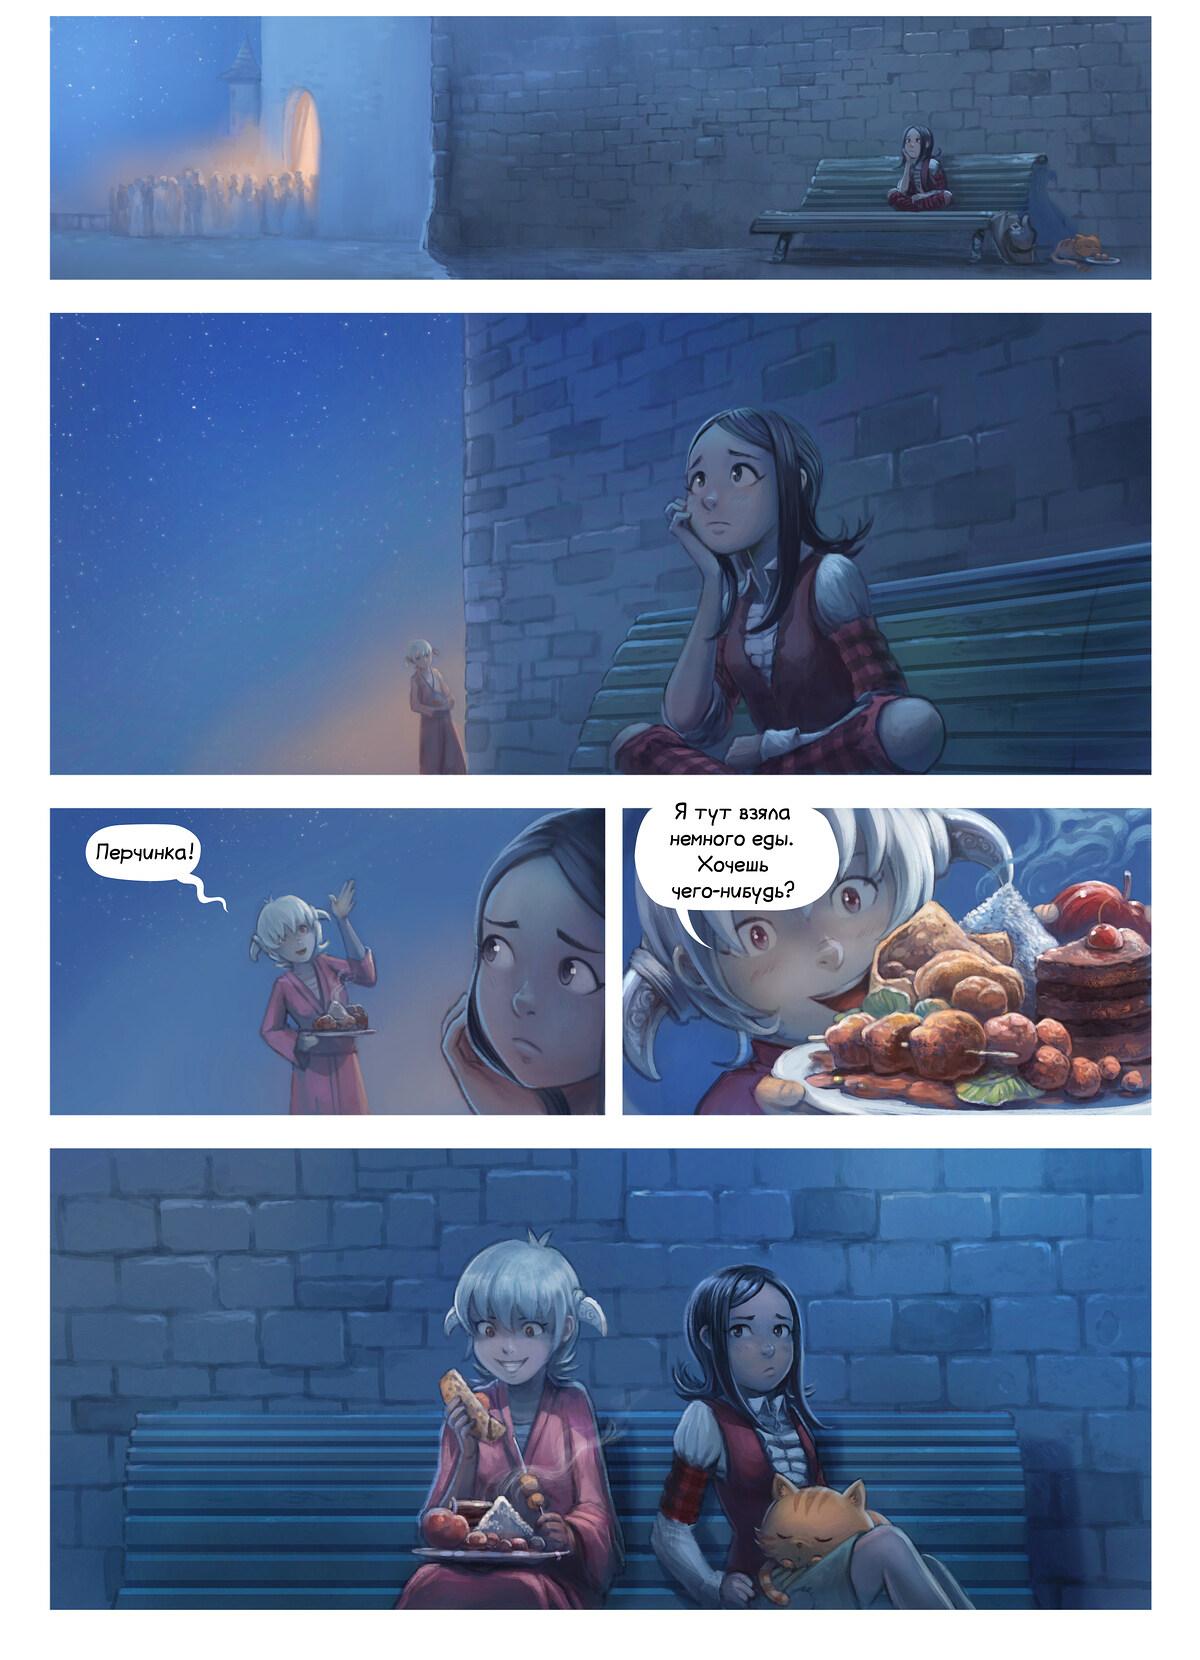 A webcomic page of Pepper&Carrot, эпизод 28 [ru], стр. 6